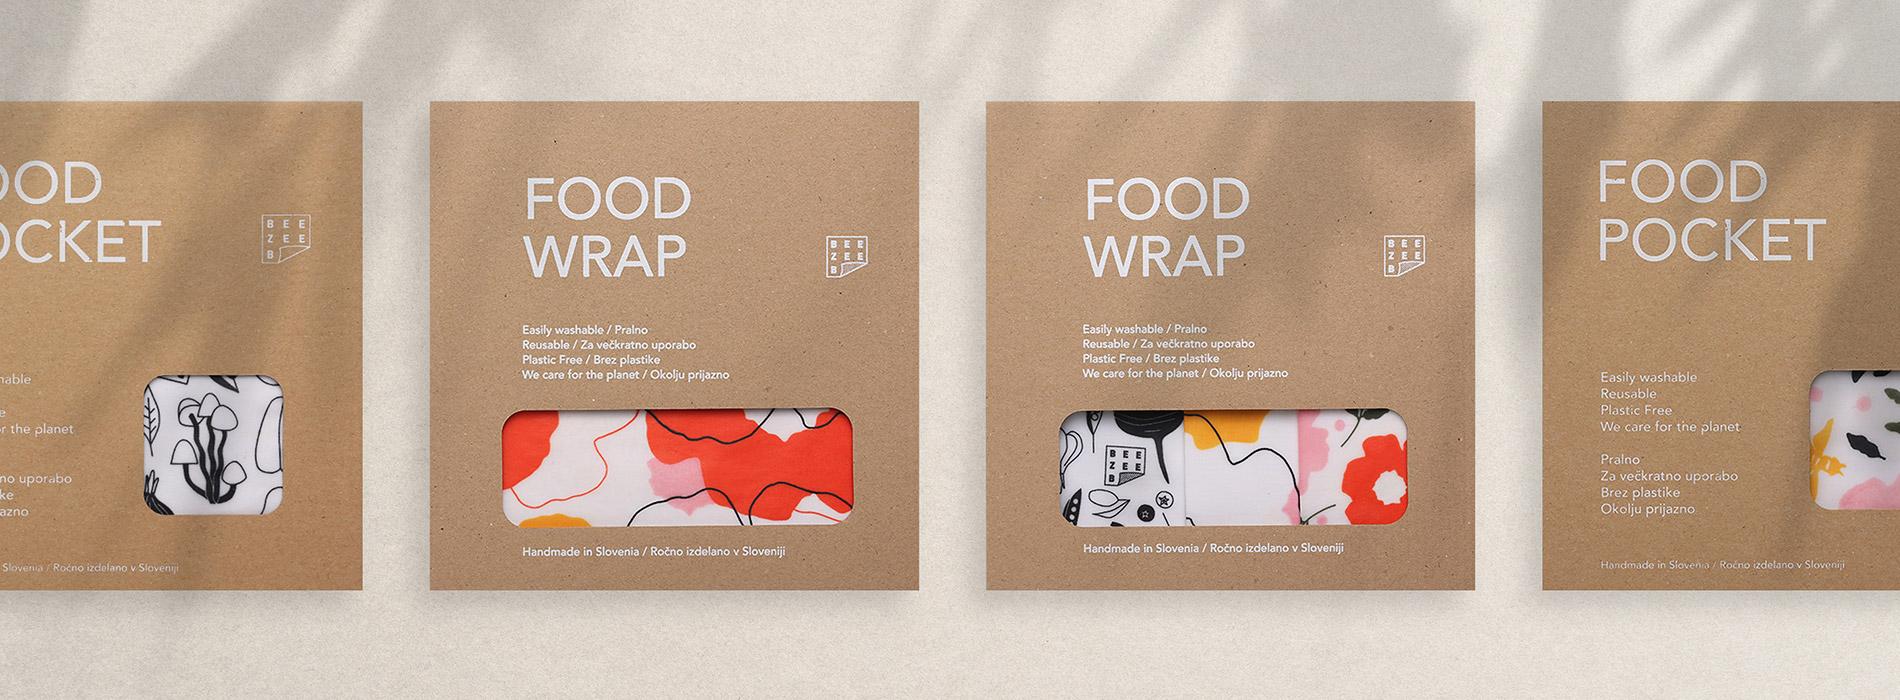 Food-wrap-slider-2